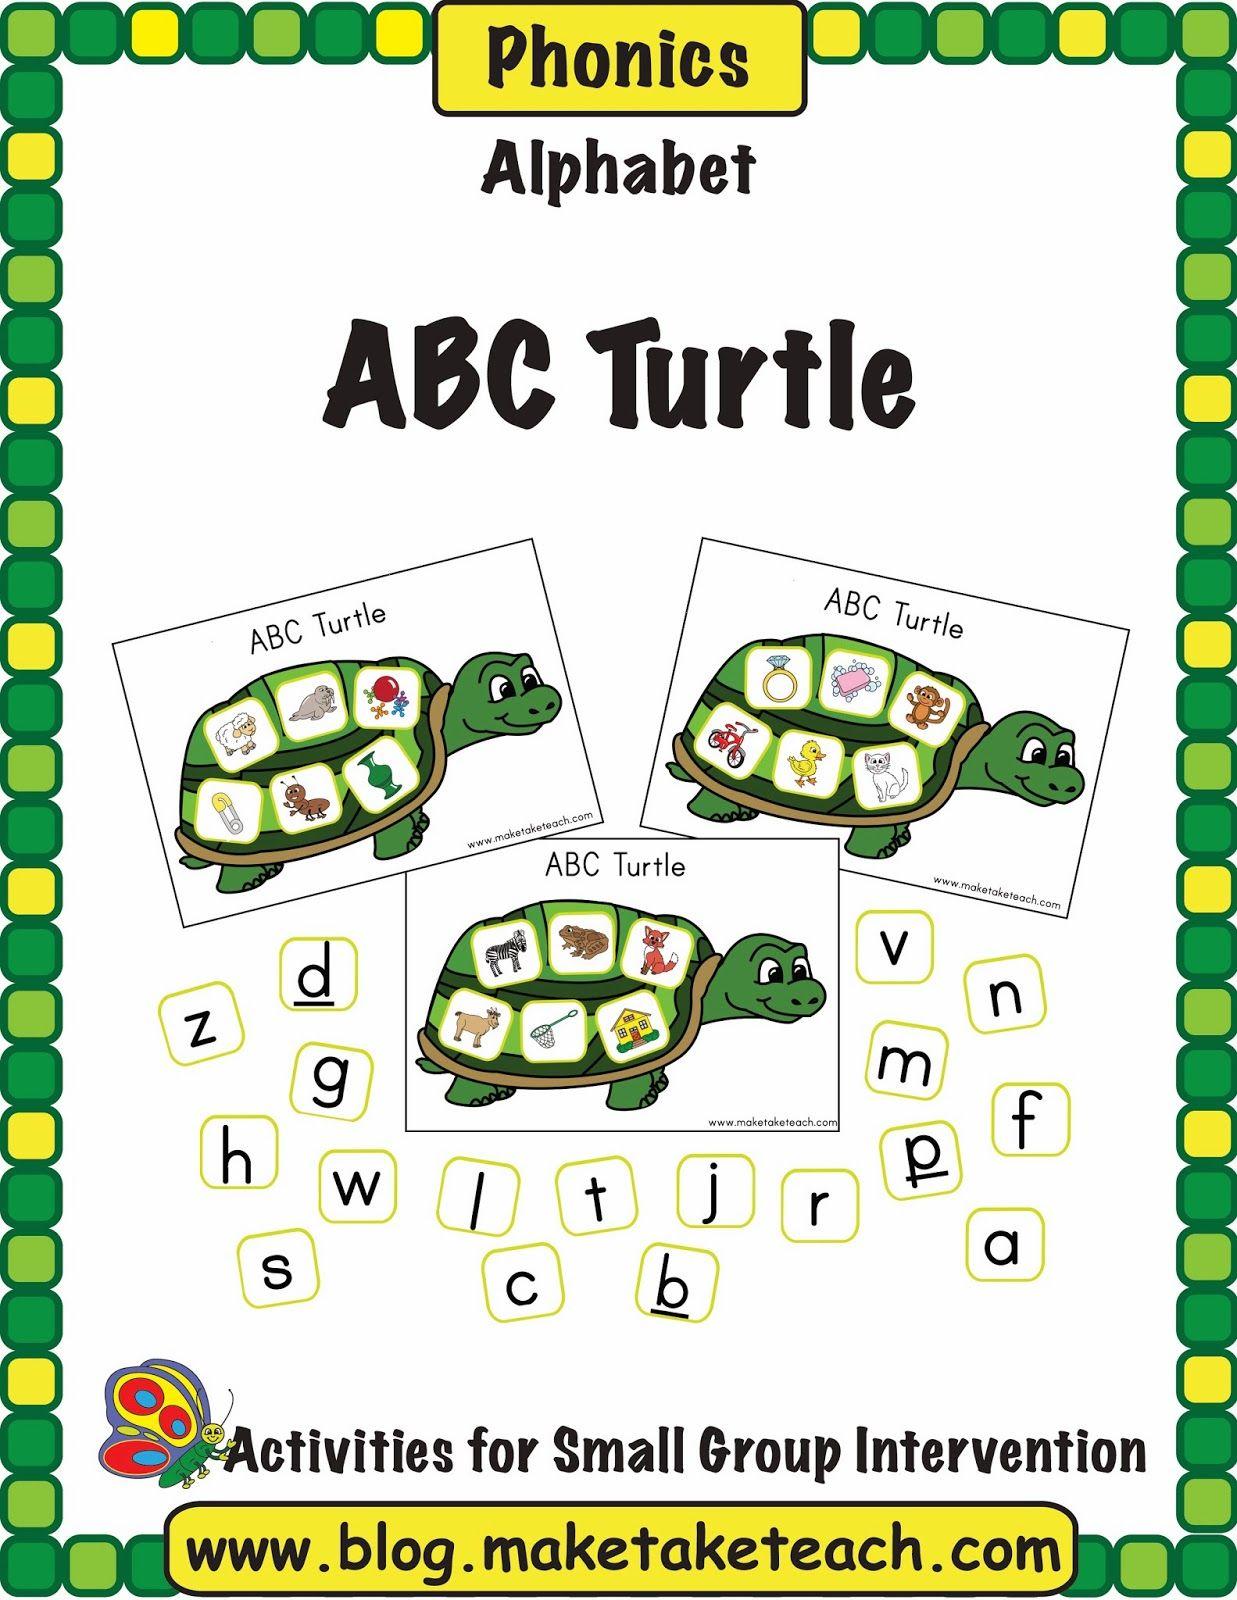 Fun Little Alphabet Game